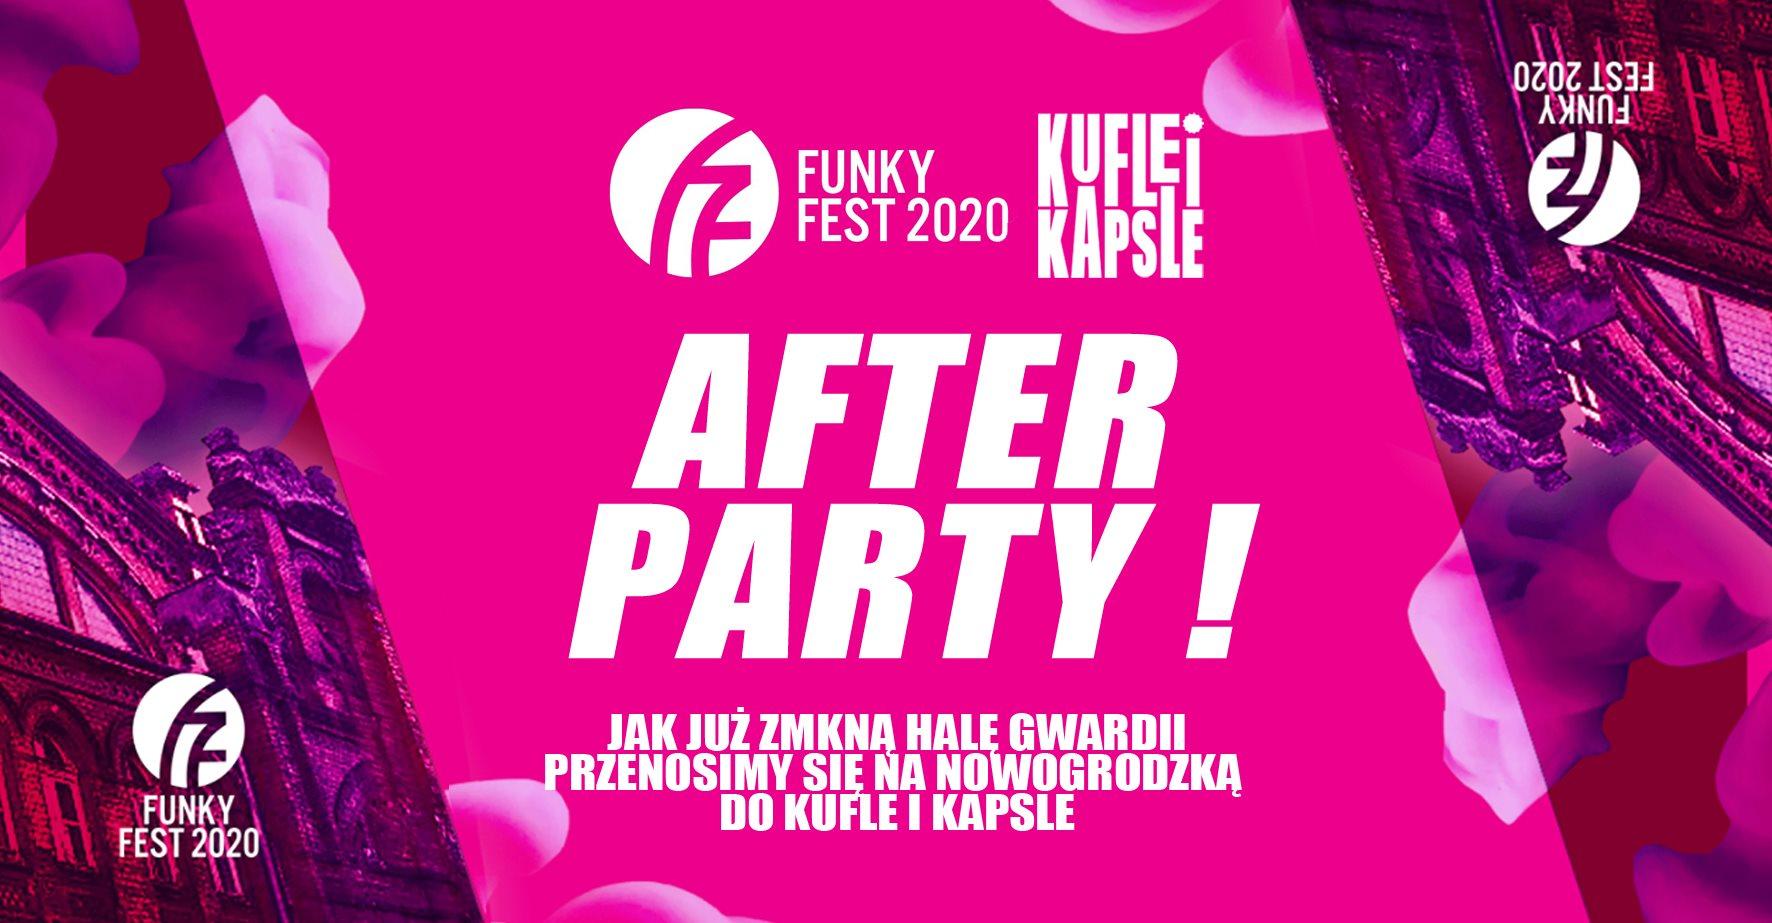 Funky Fest 2020 Afterparty w Kufle i Kapsle